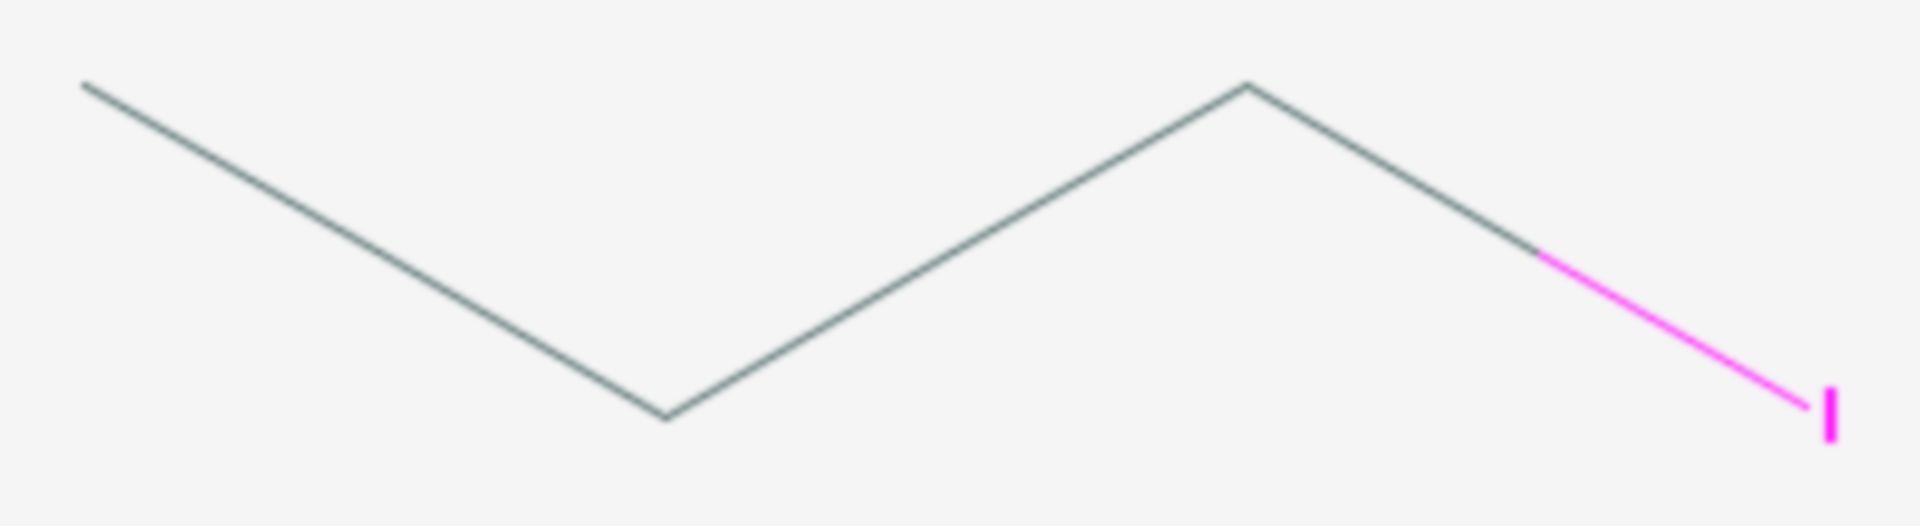 1-Iodpropan (Strukturformel)